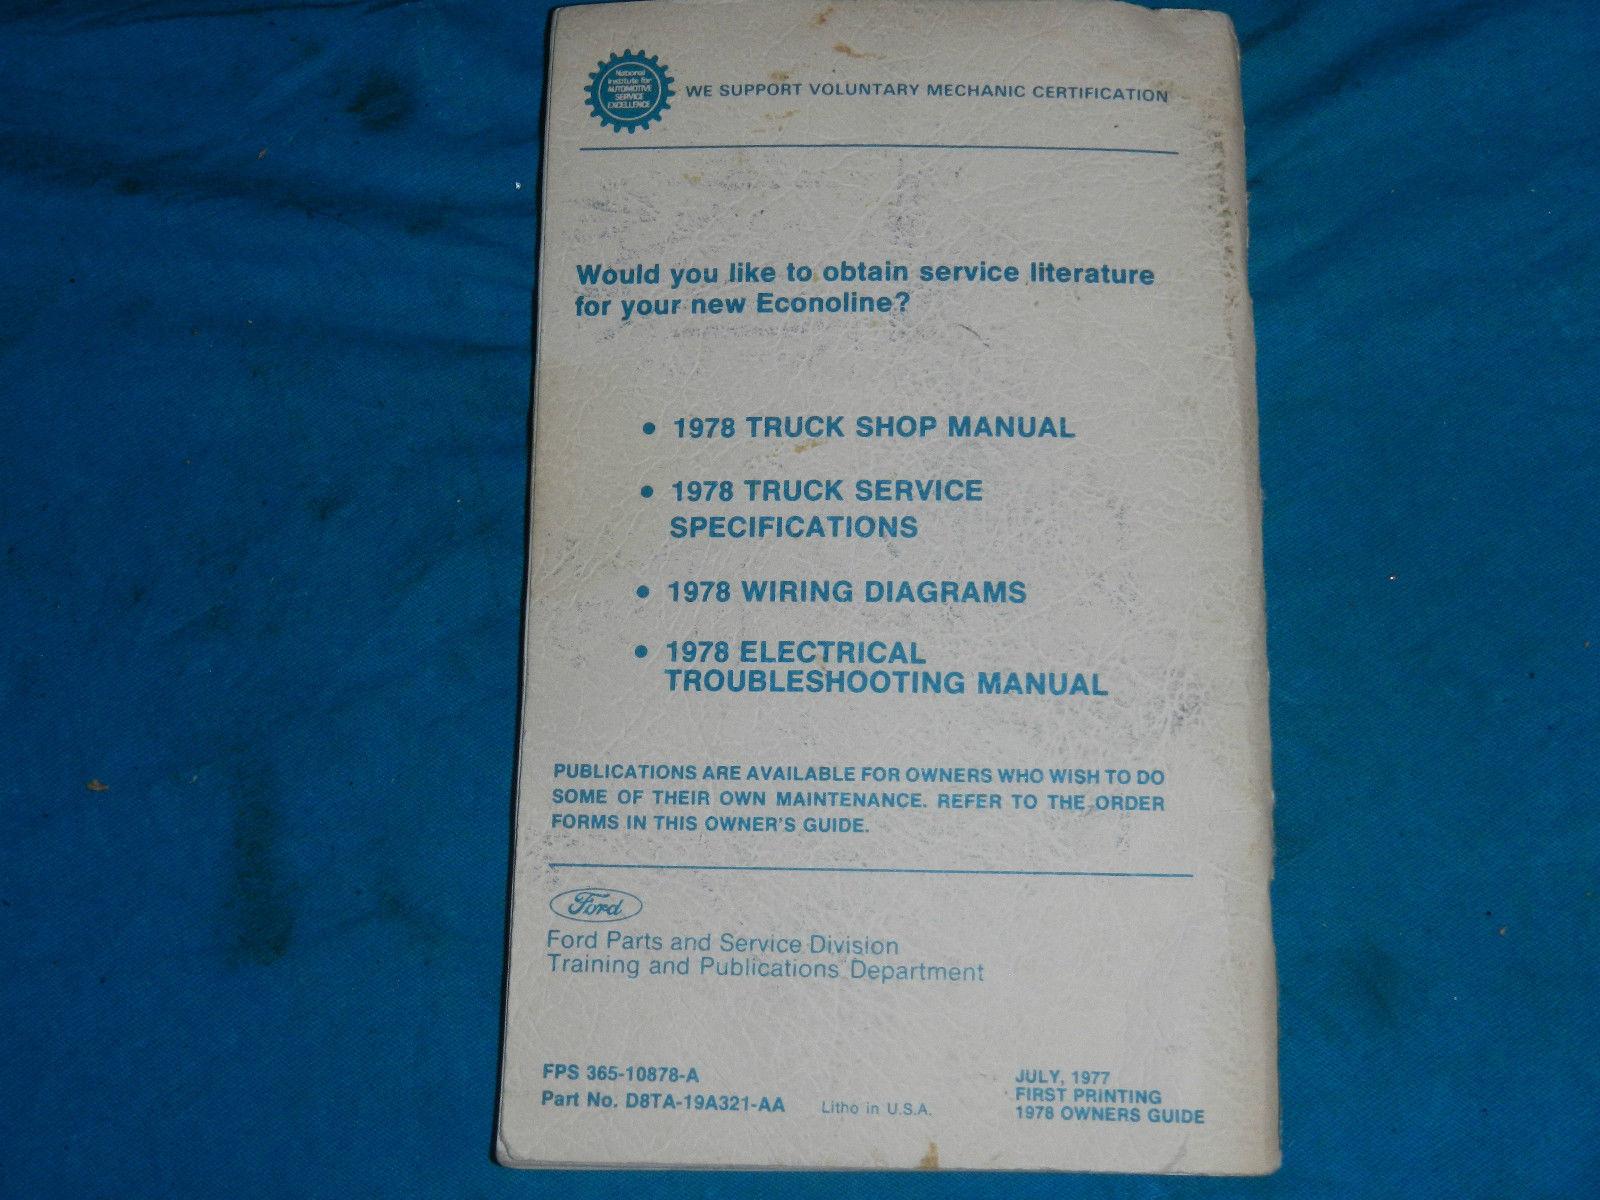 Motors Vehicle Parts & Accessories 1988 88 BUICK CENTURY OWNER'S ...